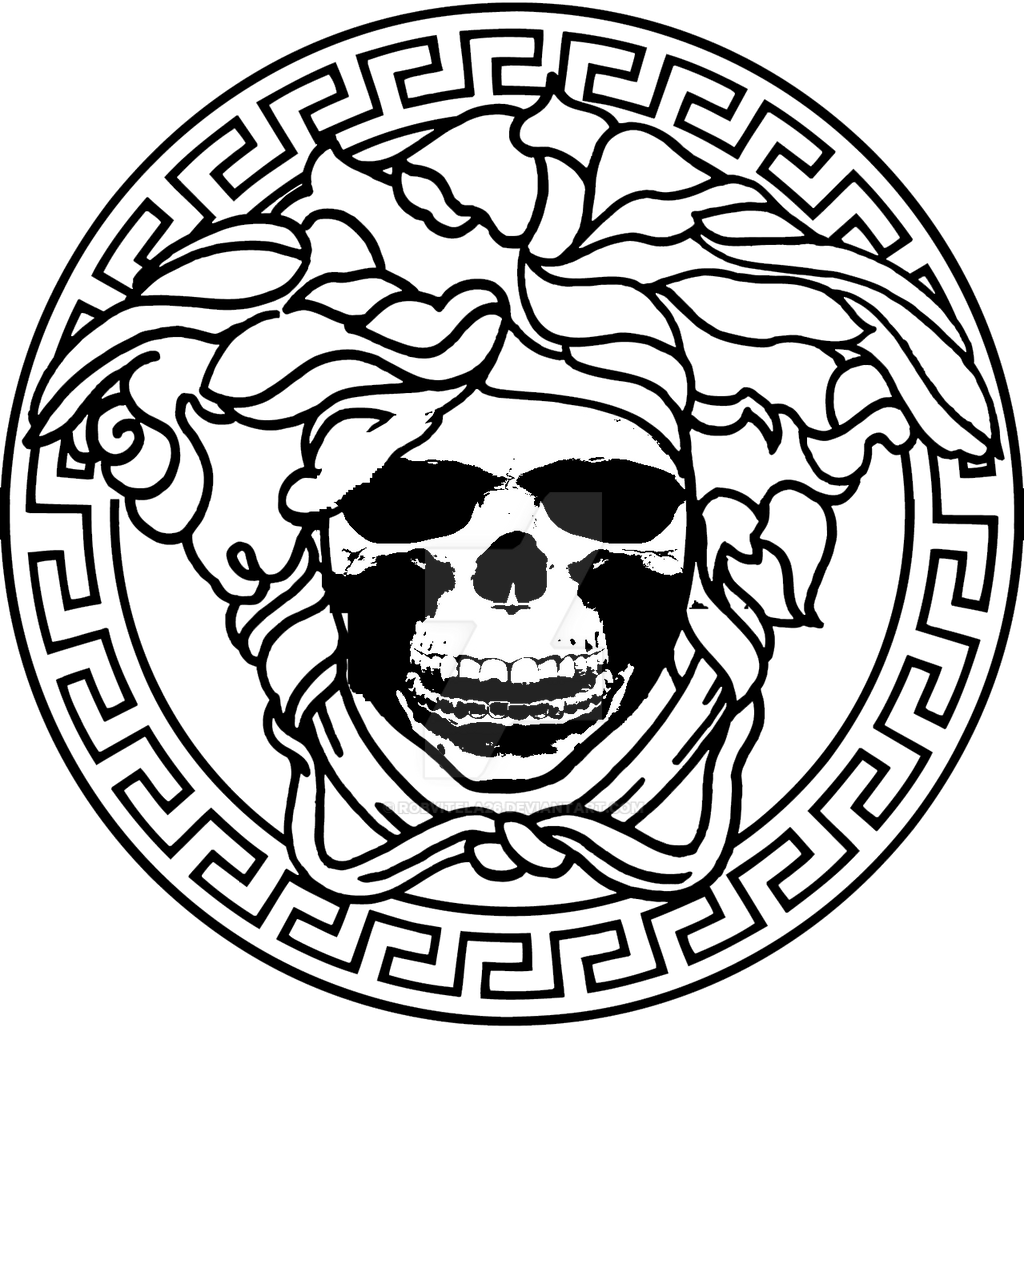 versace logo by robvitela26 on deviantart